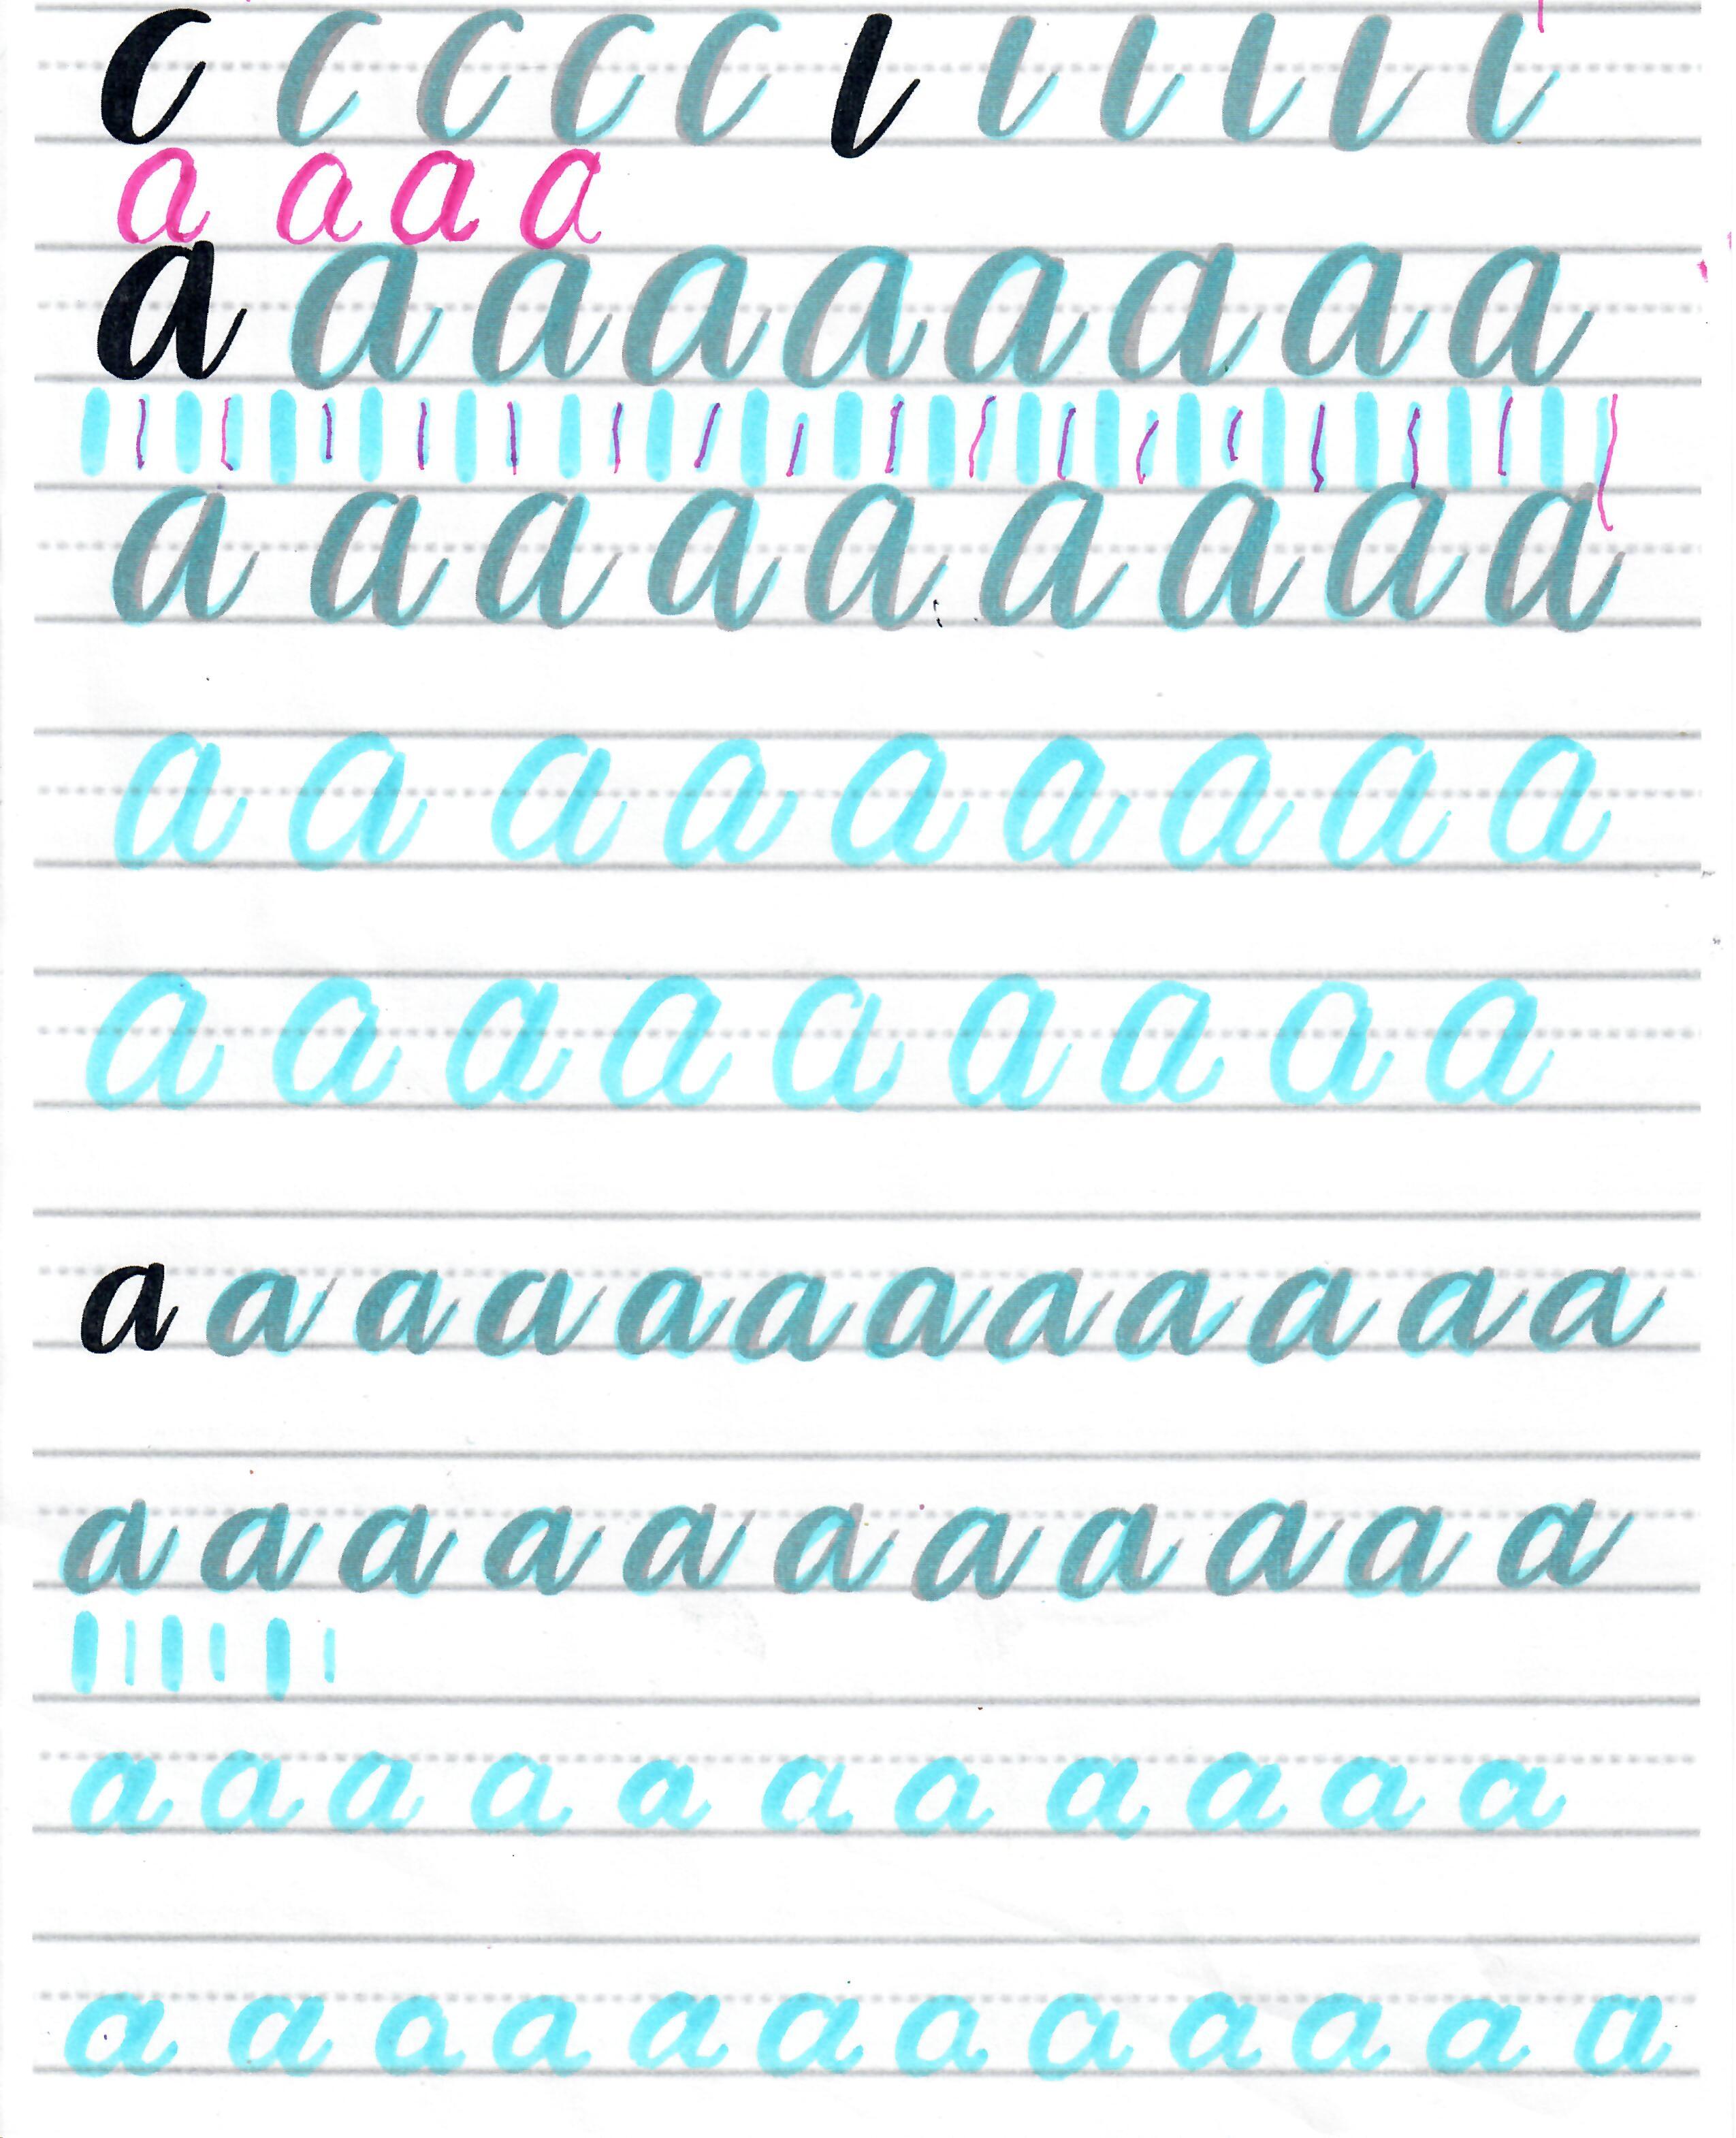 2021-08-19 Brush lettering - A a #lettering.jpg